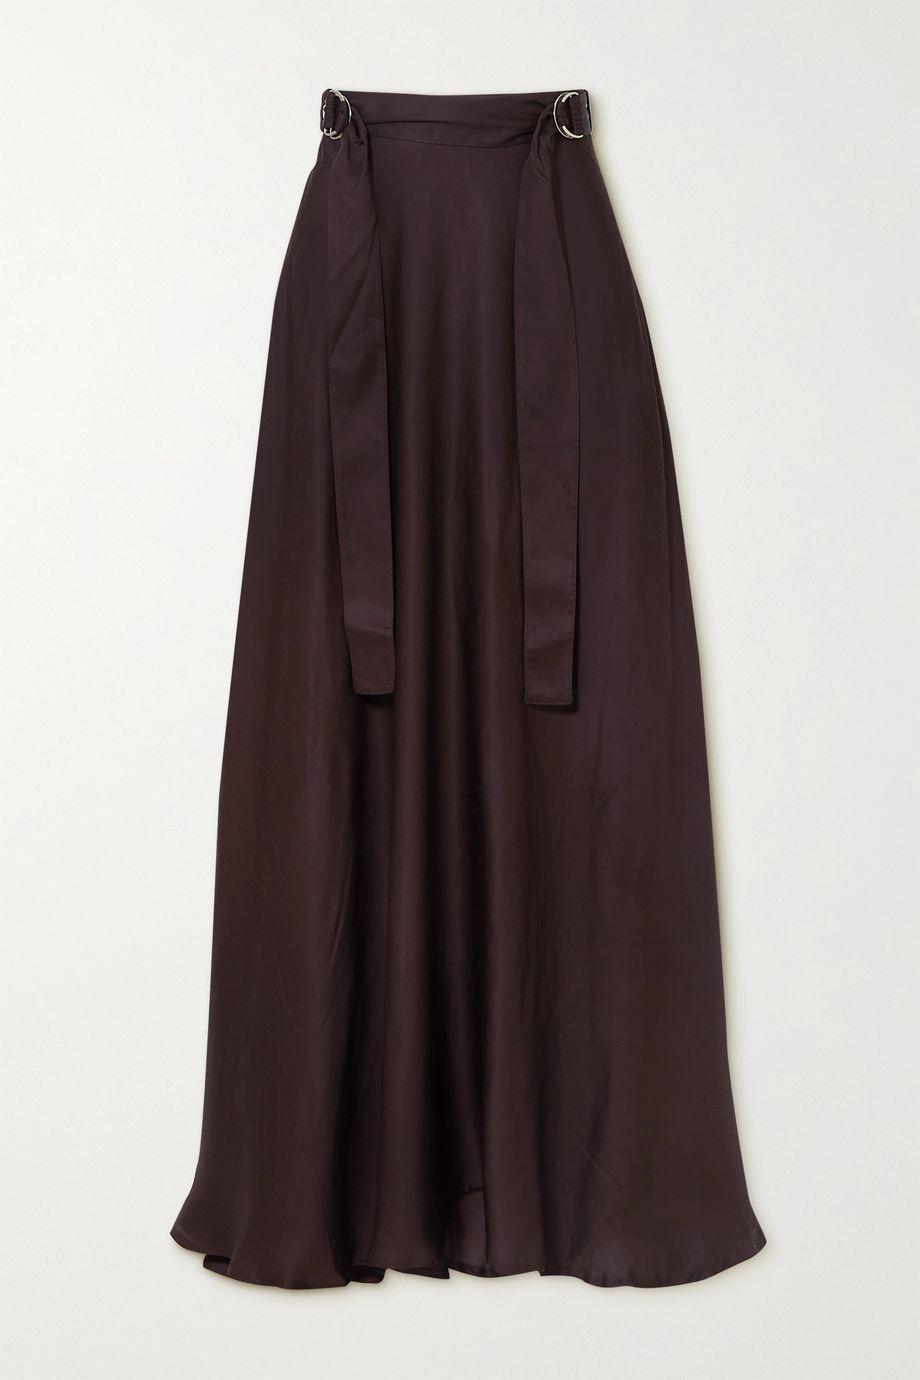 BITE Studios + NET SUSTAIN belted satin maxi skirt